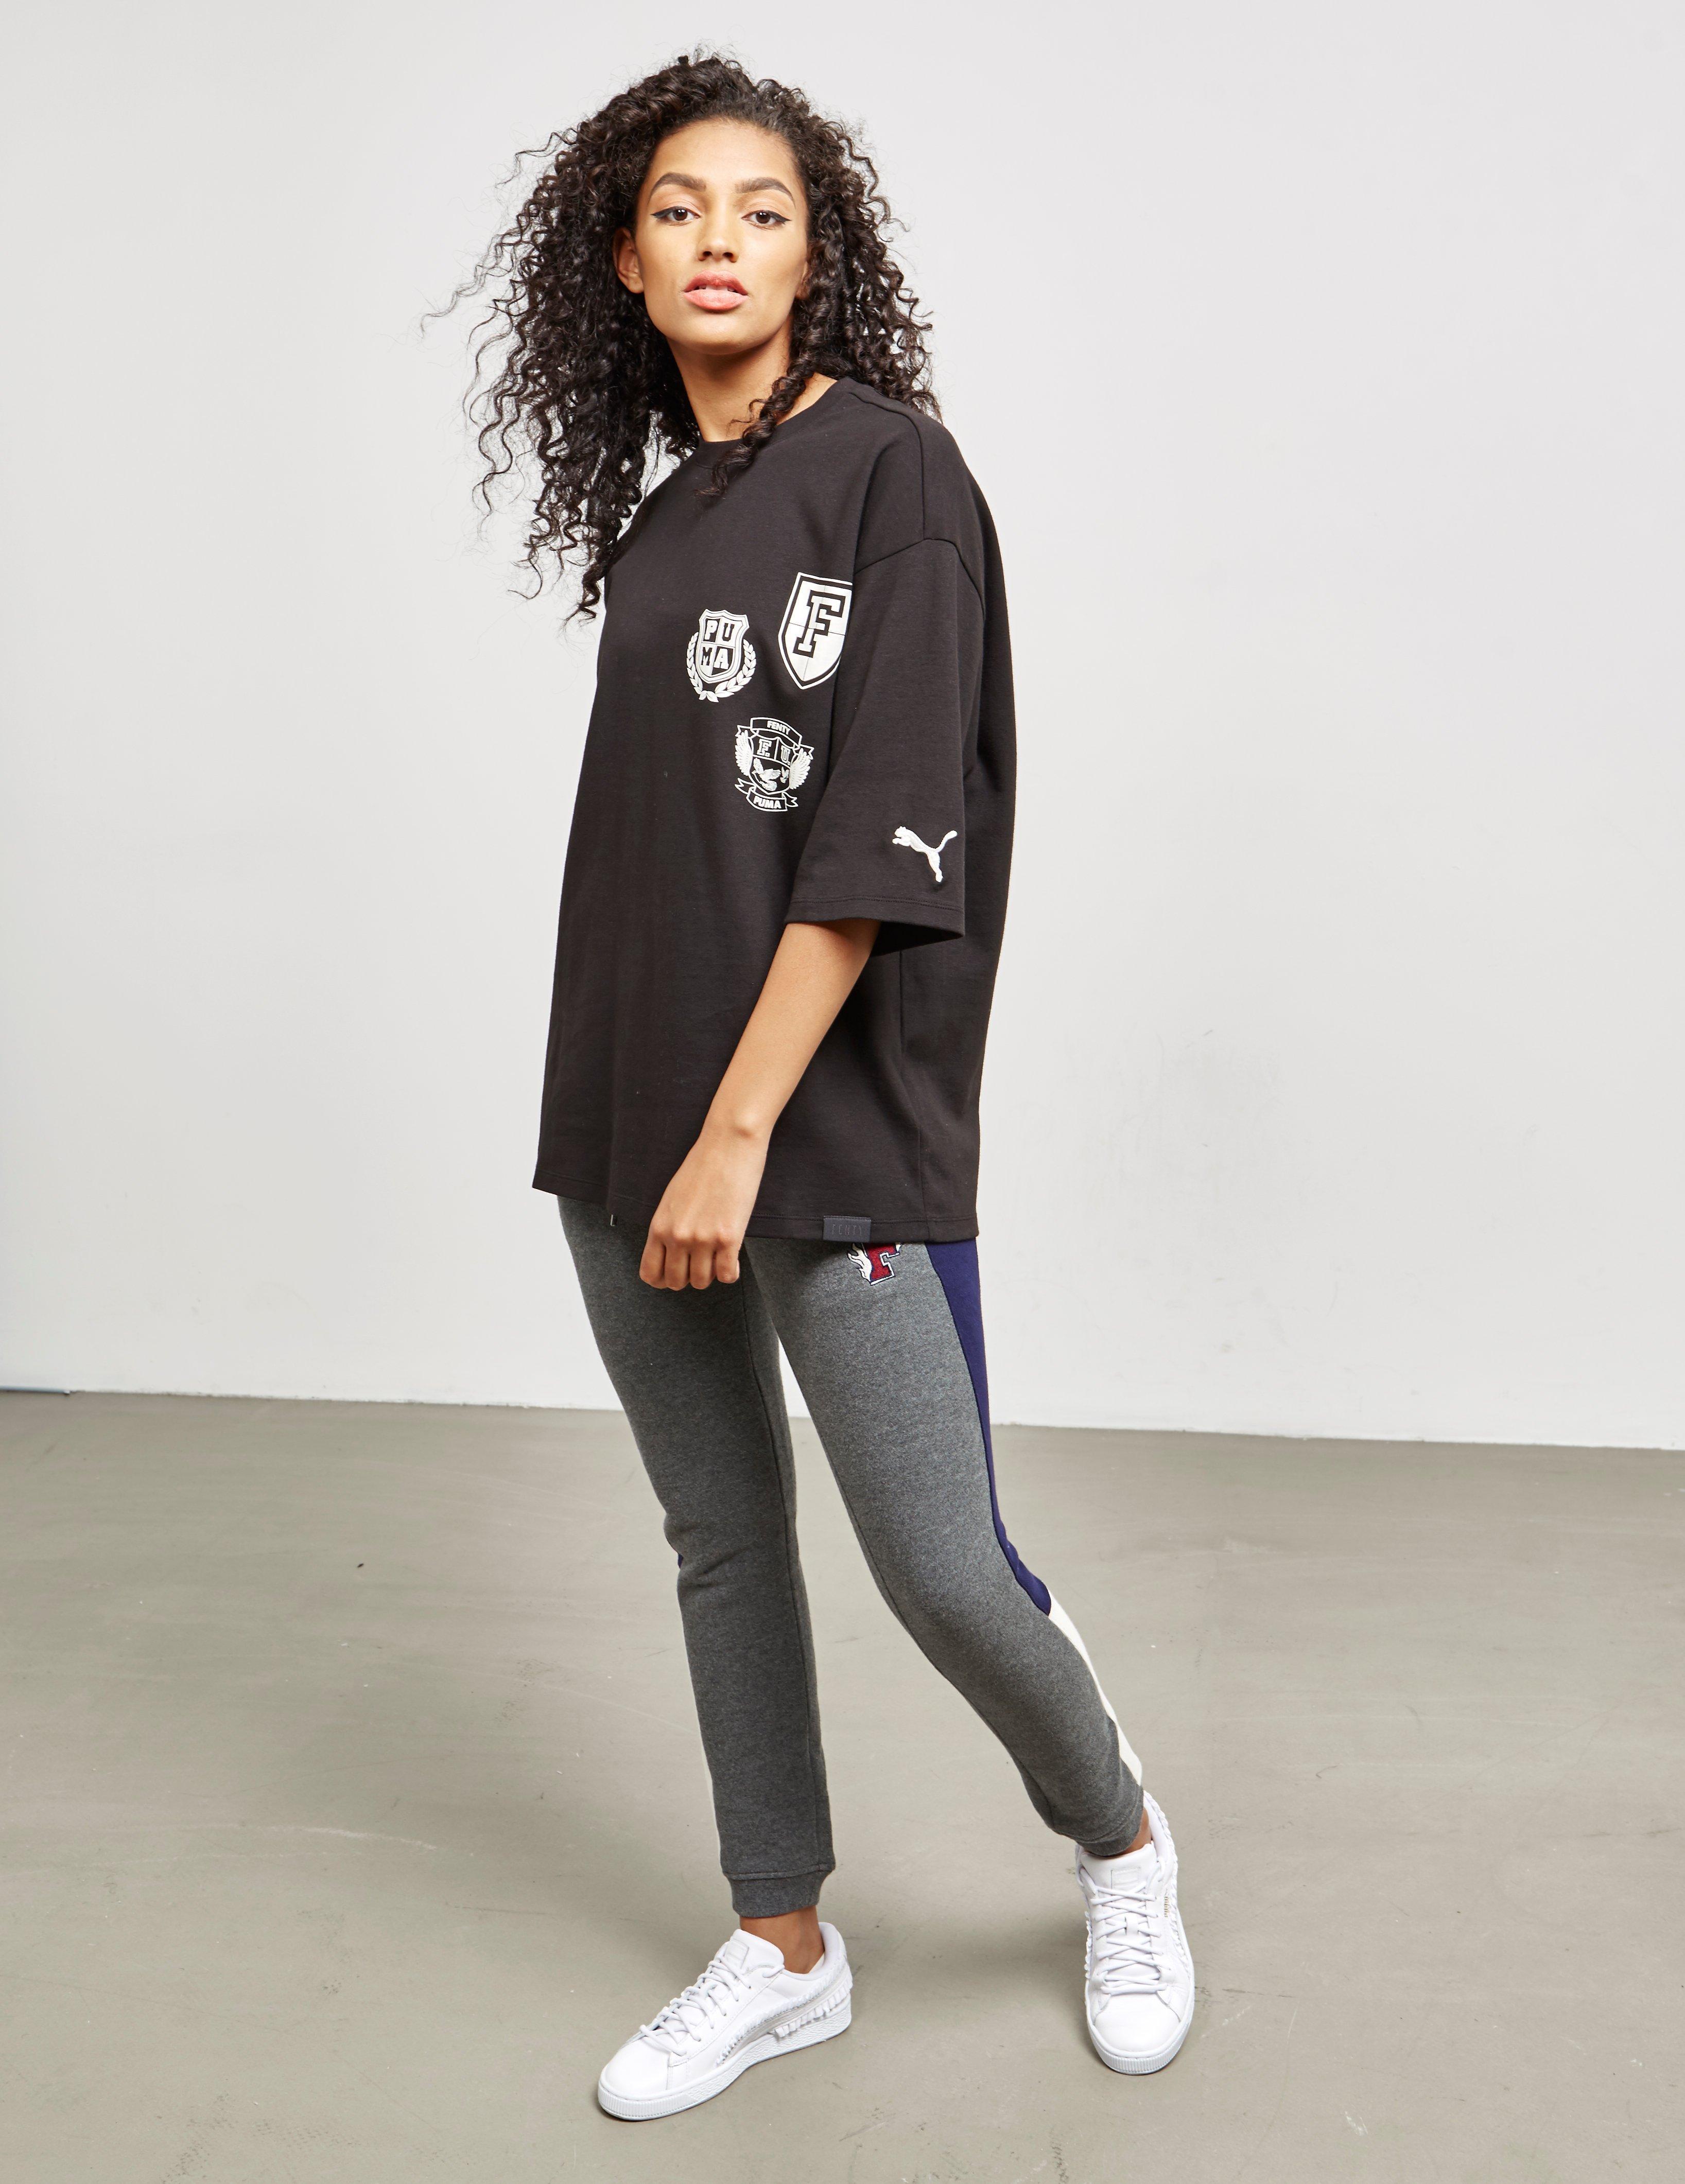 innovative design 8b2ca 3b369 PUMA Womens X Fenty Badge Short Sleeve T-shirt Black in ...